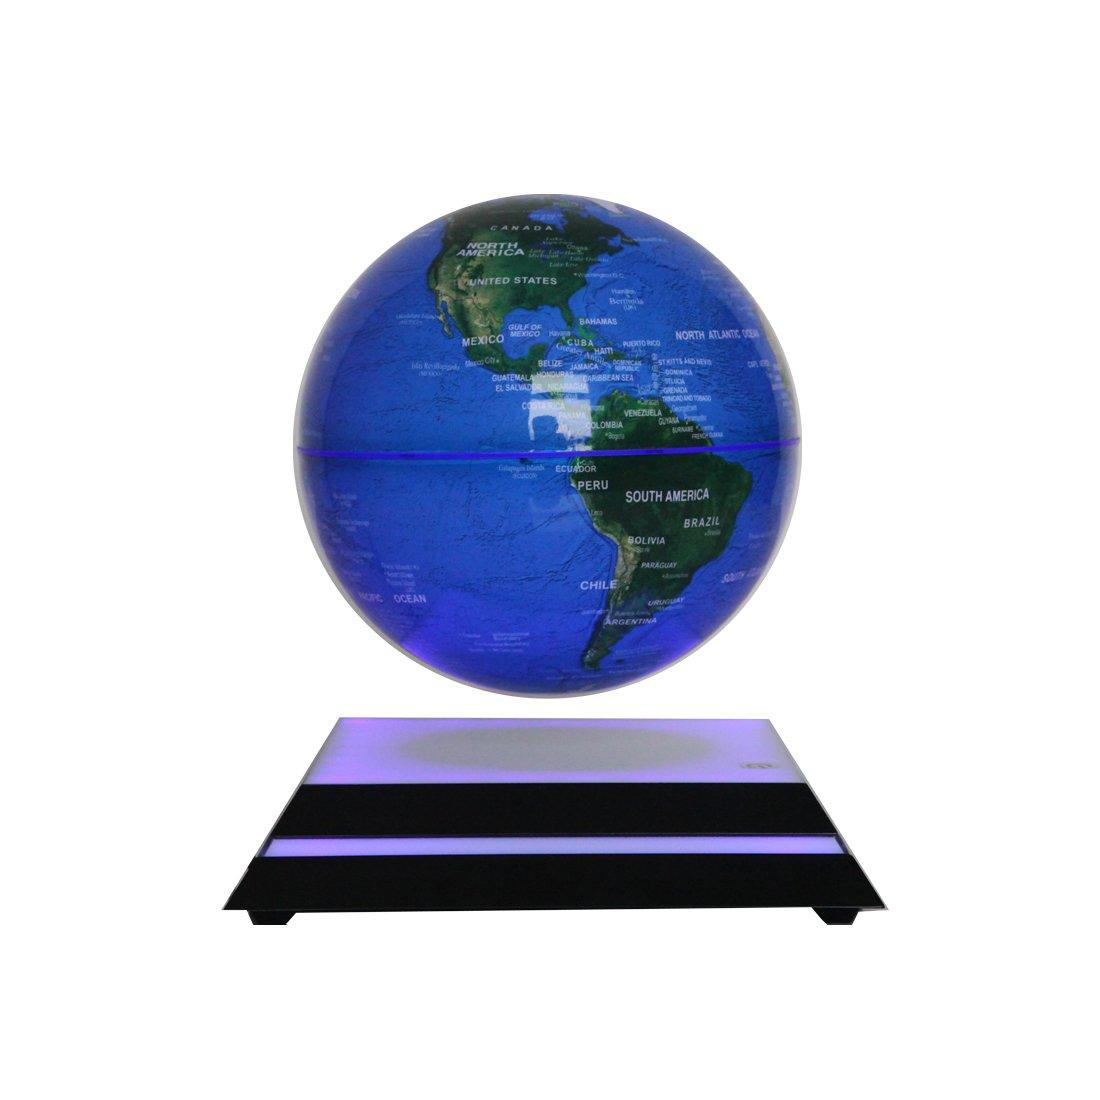 Mindbreaker 6'' LED Light Globes Luminous Globes Magnet Toys Levitation Floating Magnetic Rotating Globe Anti-gravity Floating Levitating Earth Luminous Sphere Wireless Power Supply(blue) by Mindbreaker